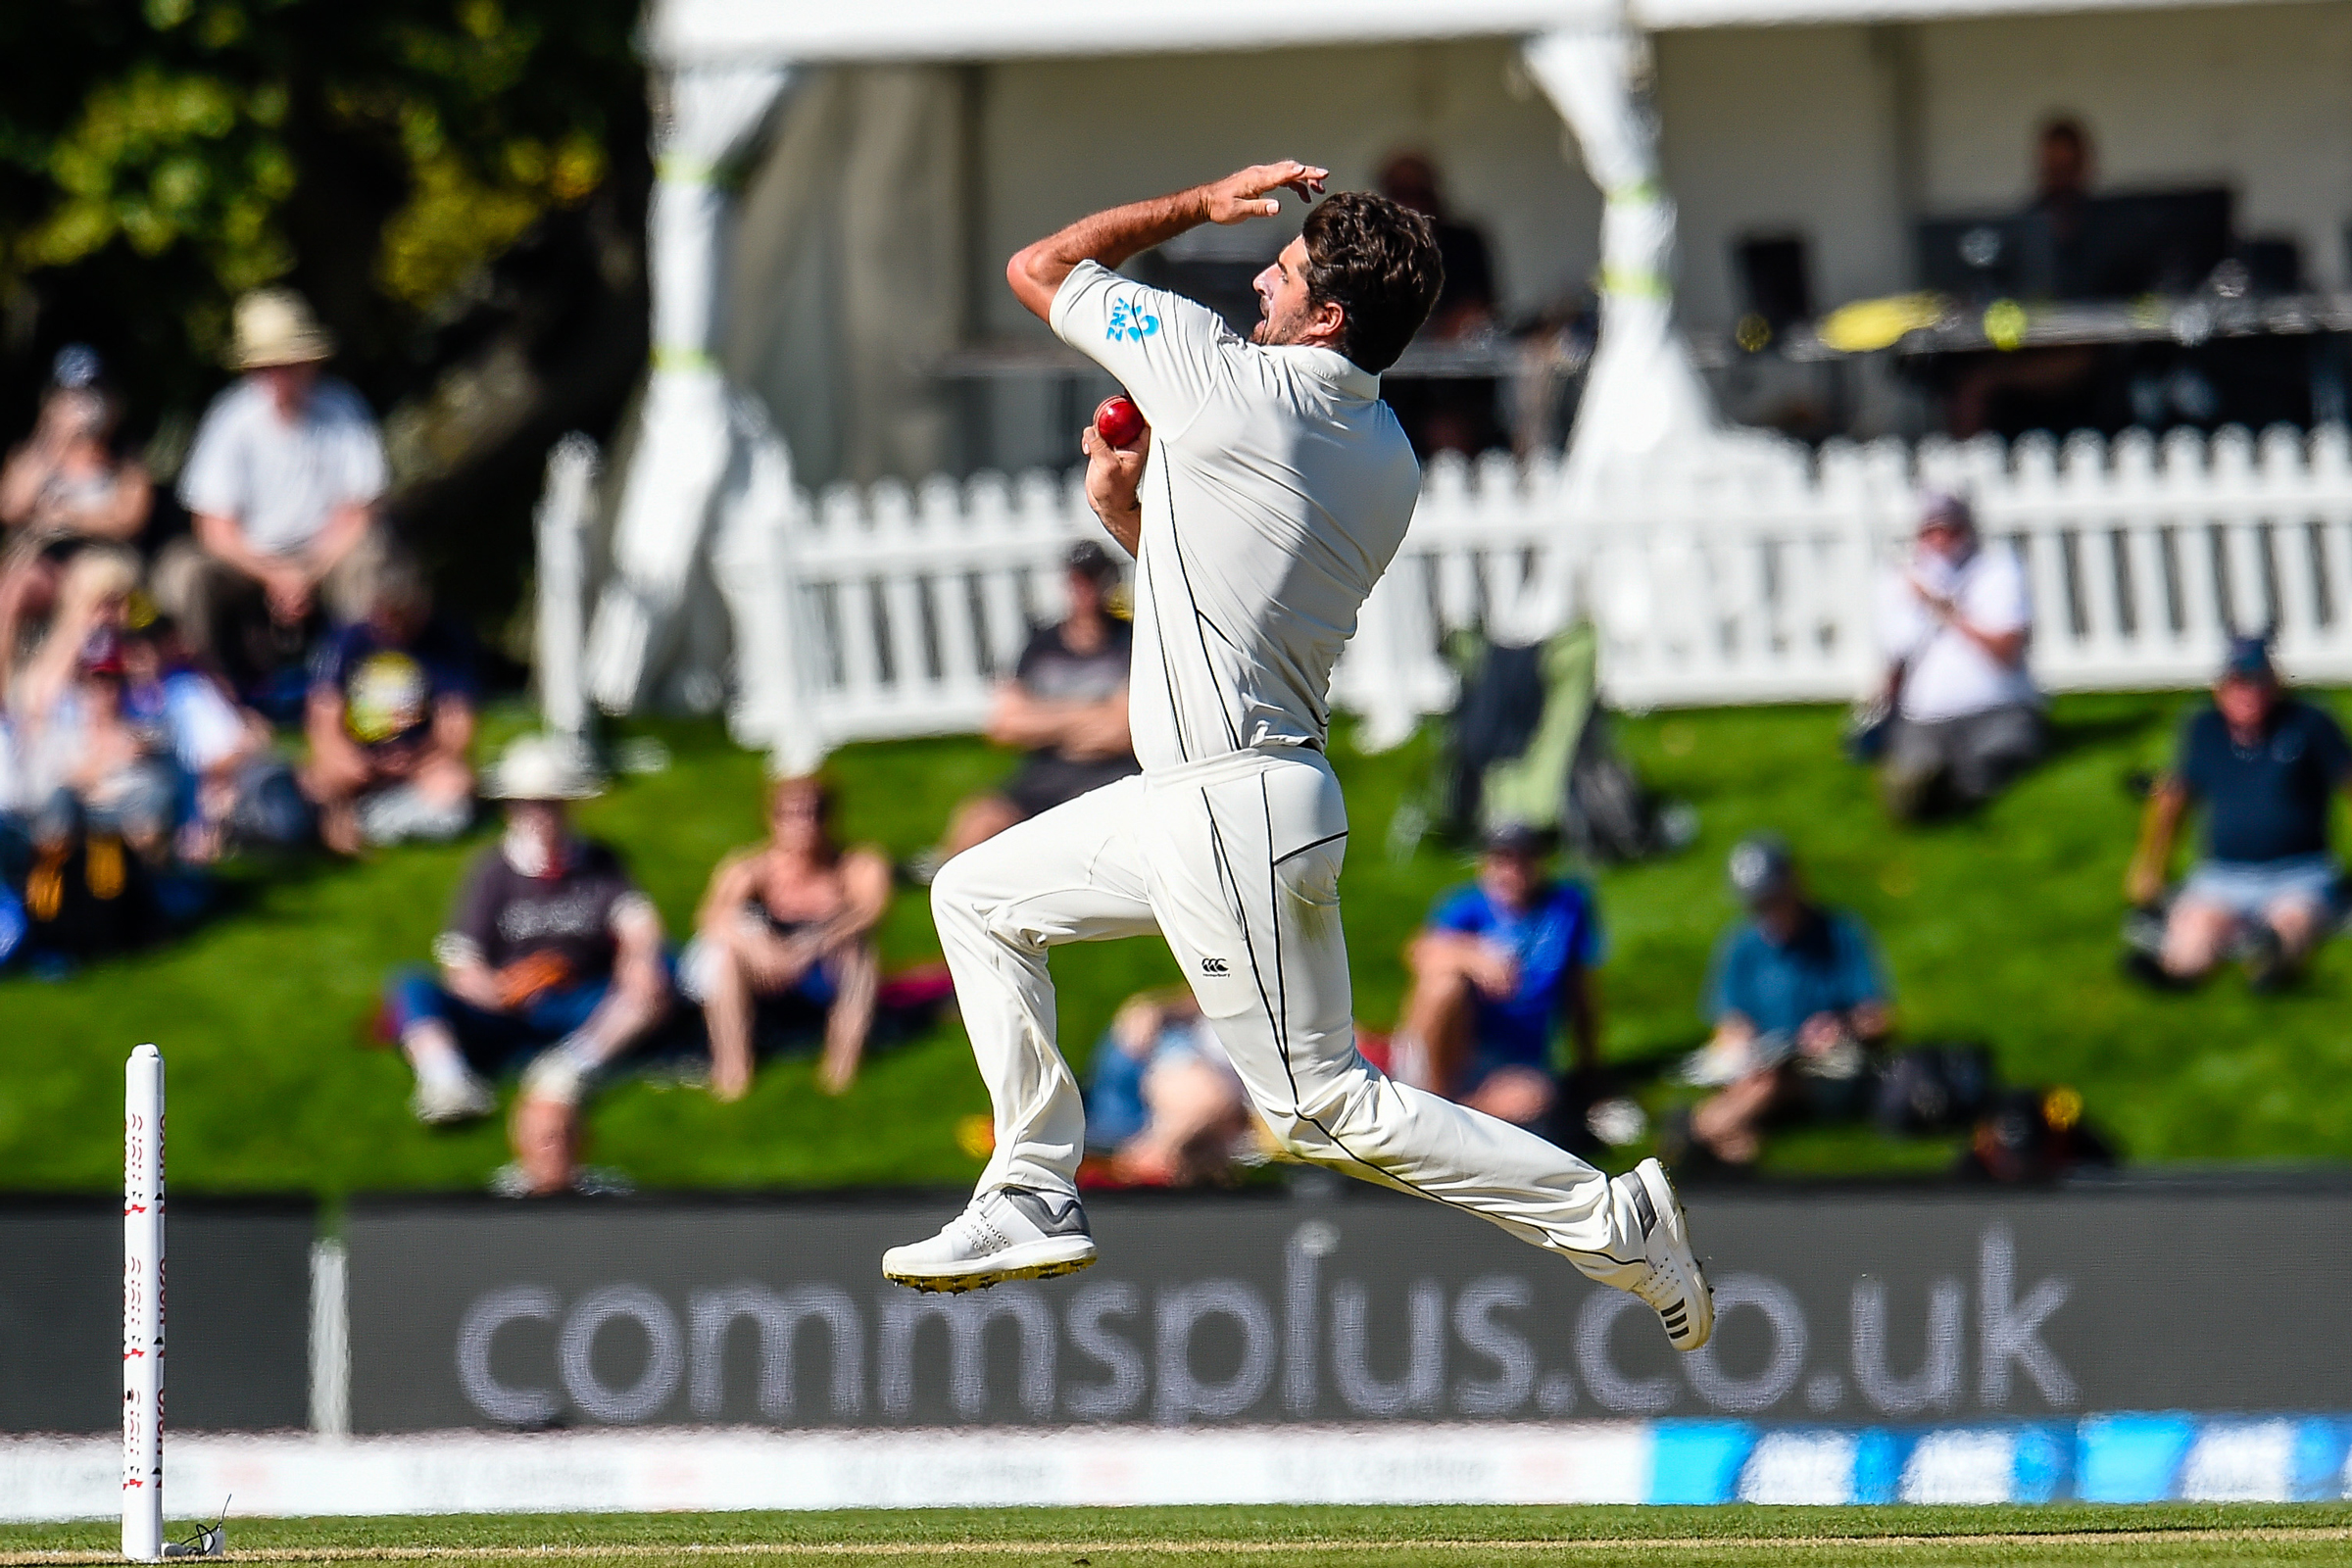 Commsplus Sponsor England Cricket